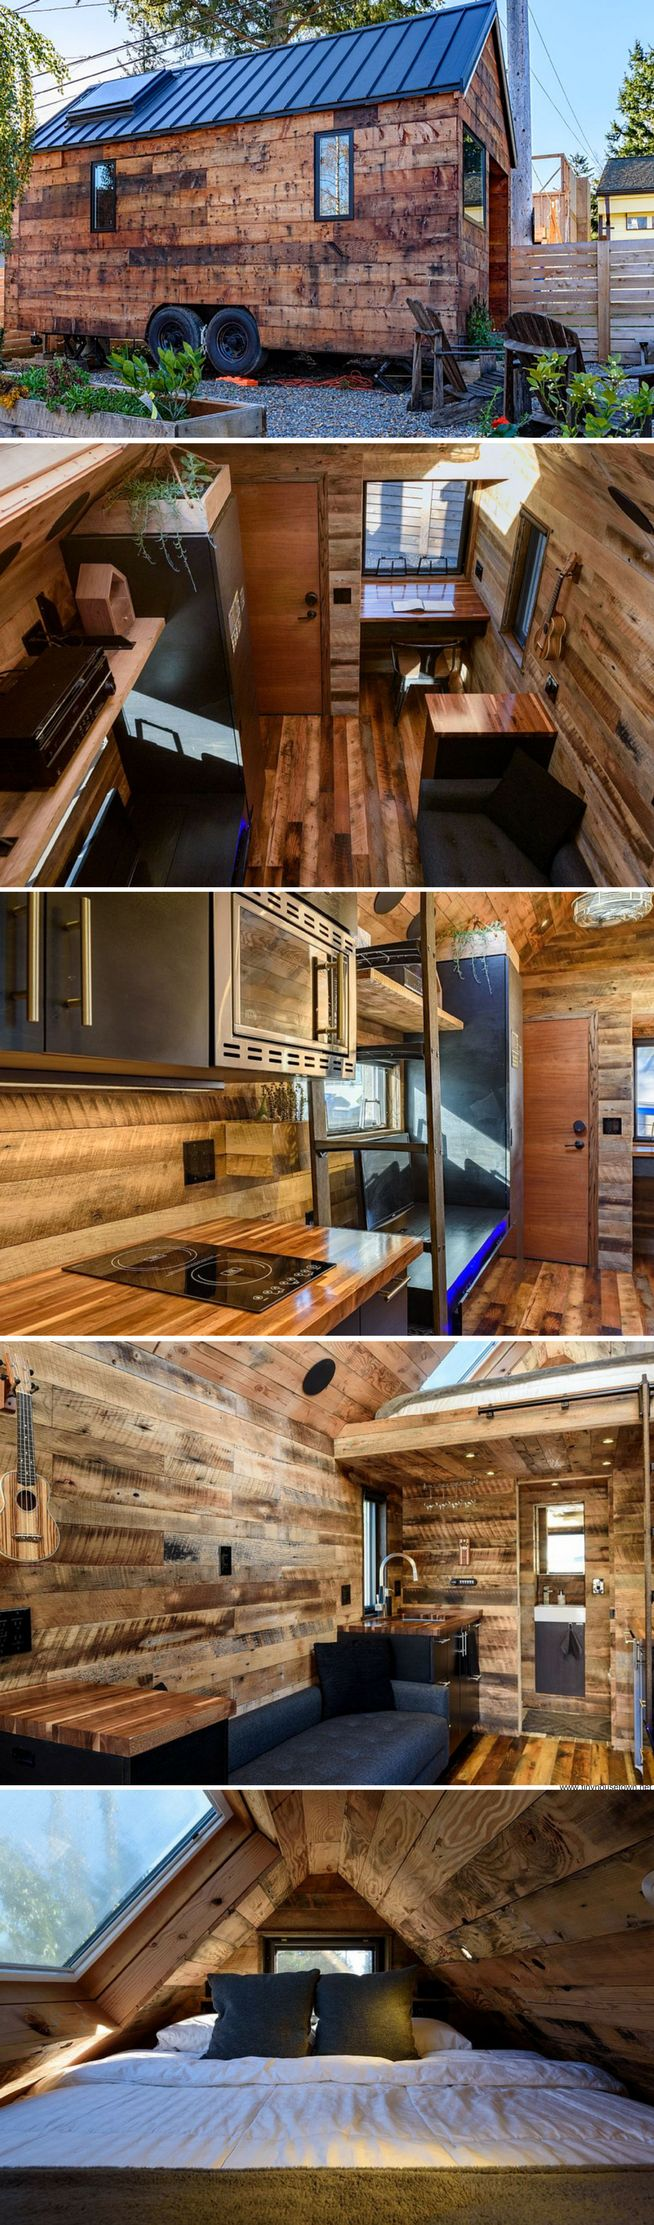 Bachelor 484 sq ft log home kit log cabin kit mountain ridge - The Tipsy Tiny House 180 Sq Ft